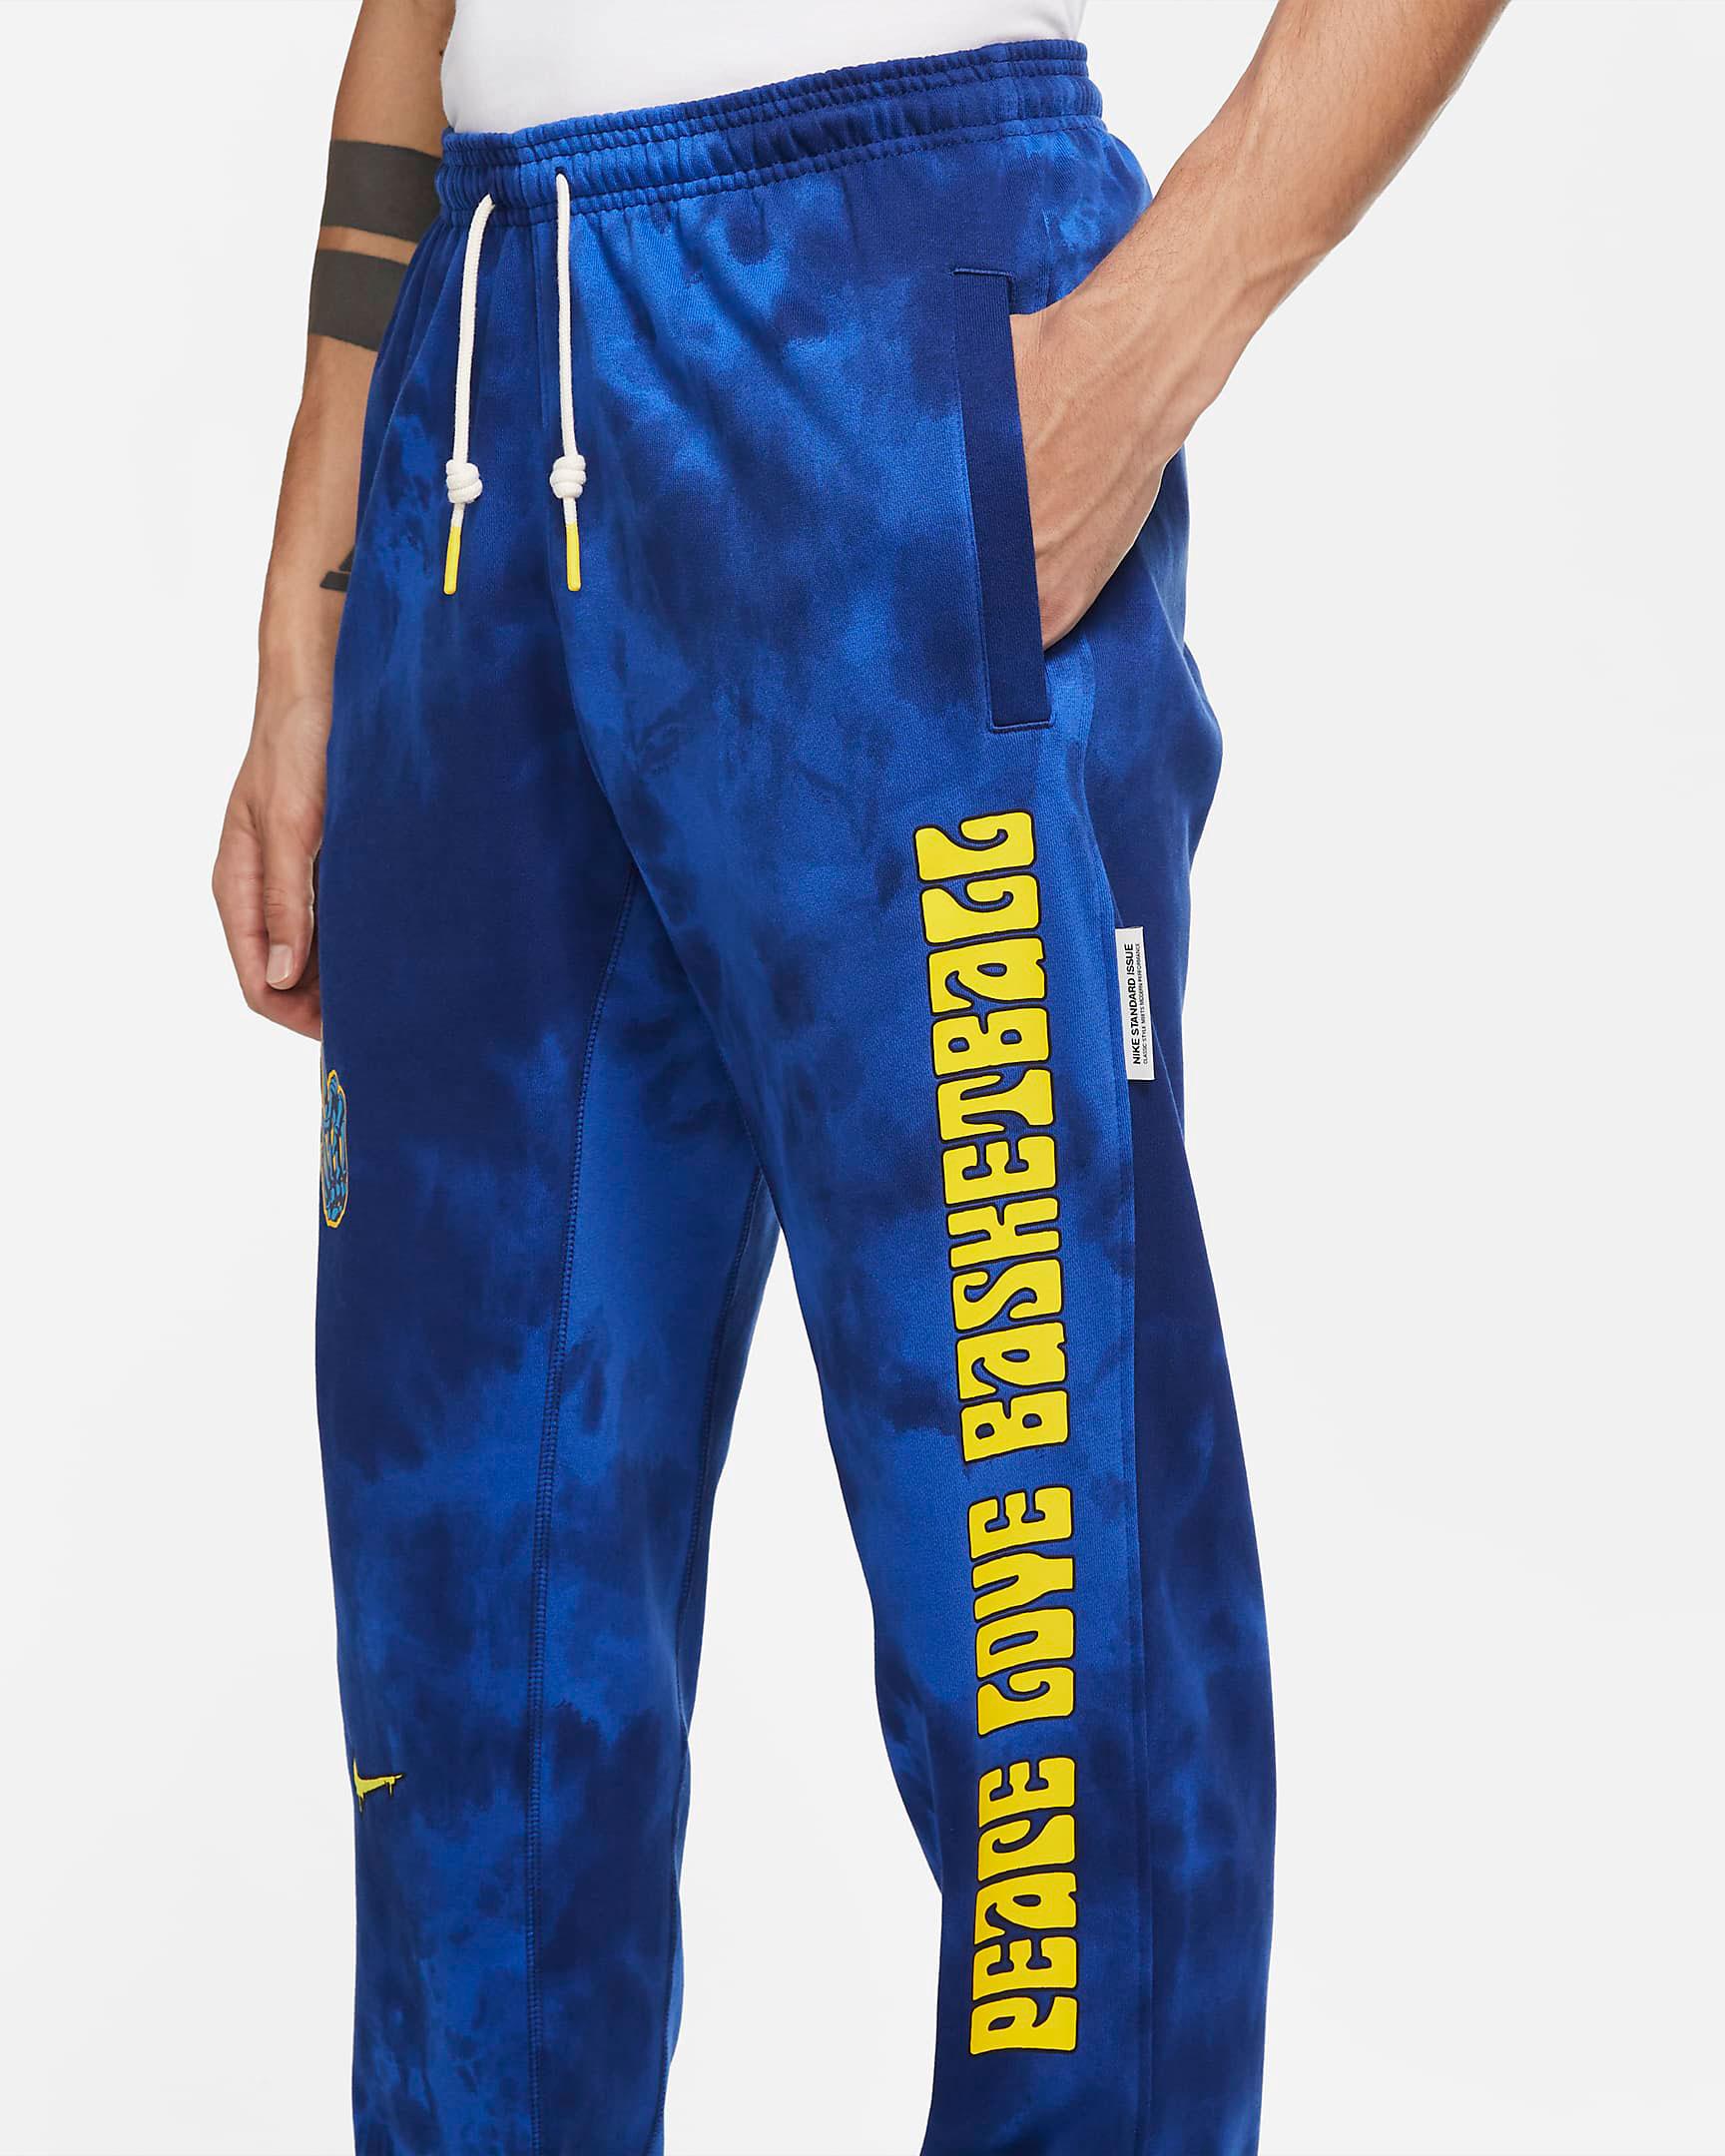 nike-peace-love-basketball-pants-blue-3